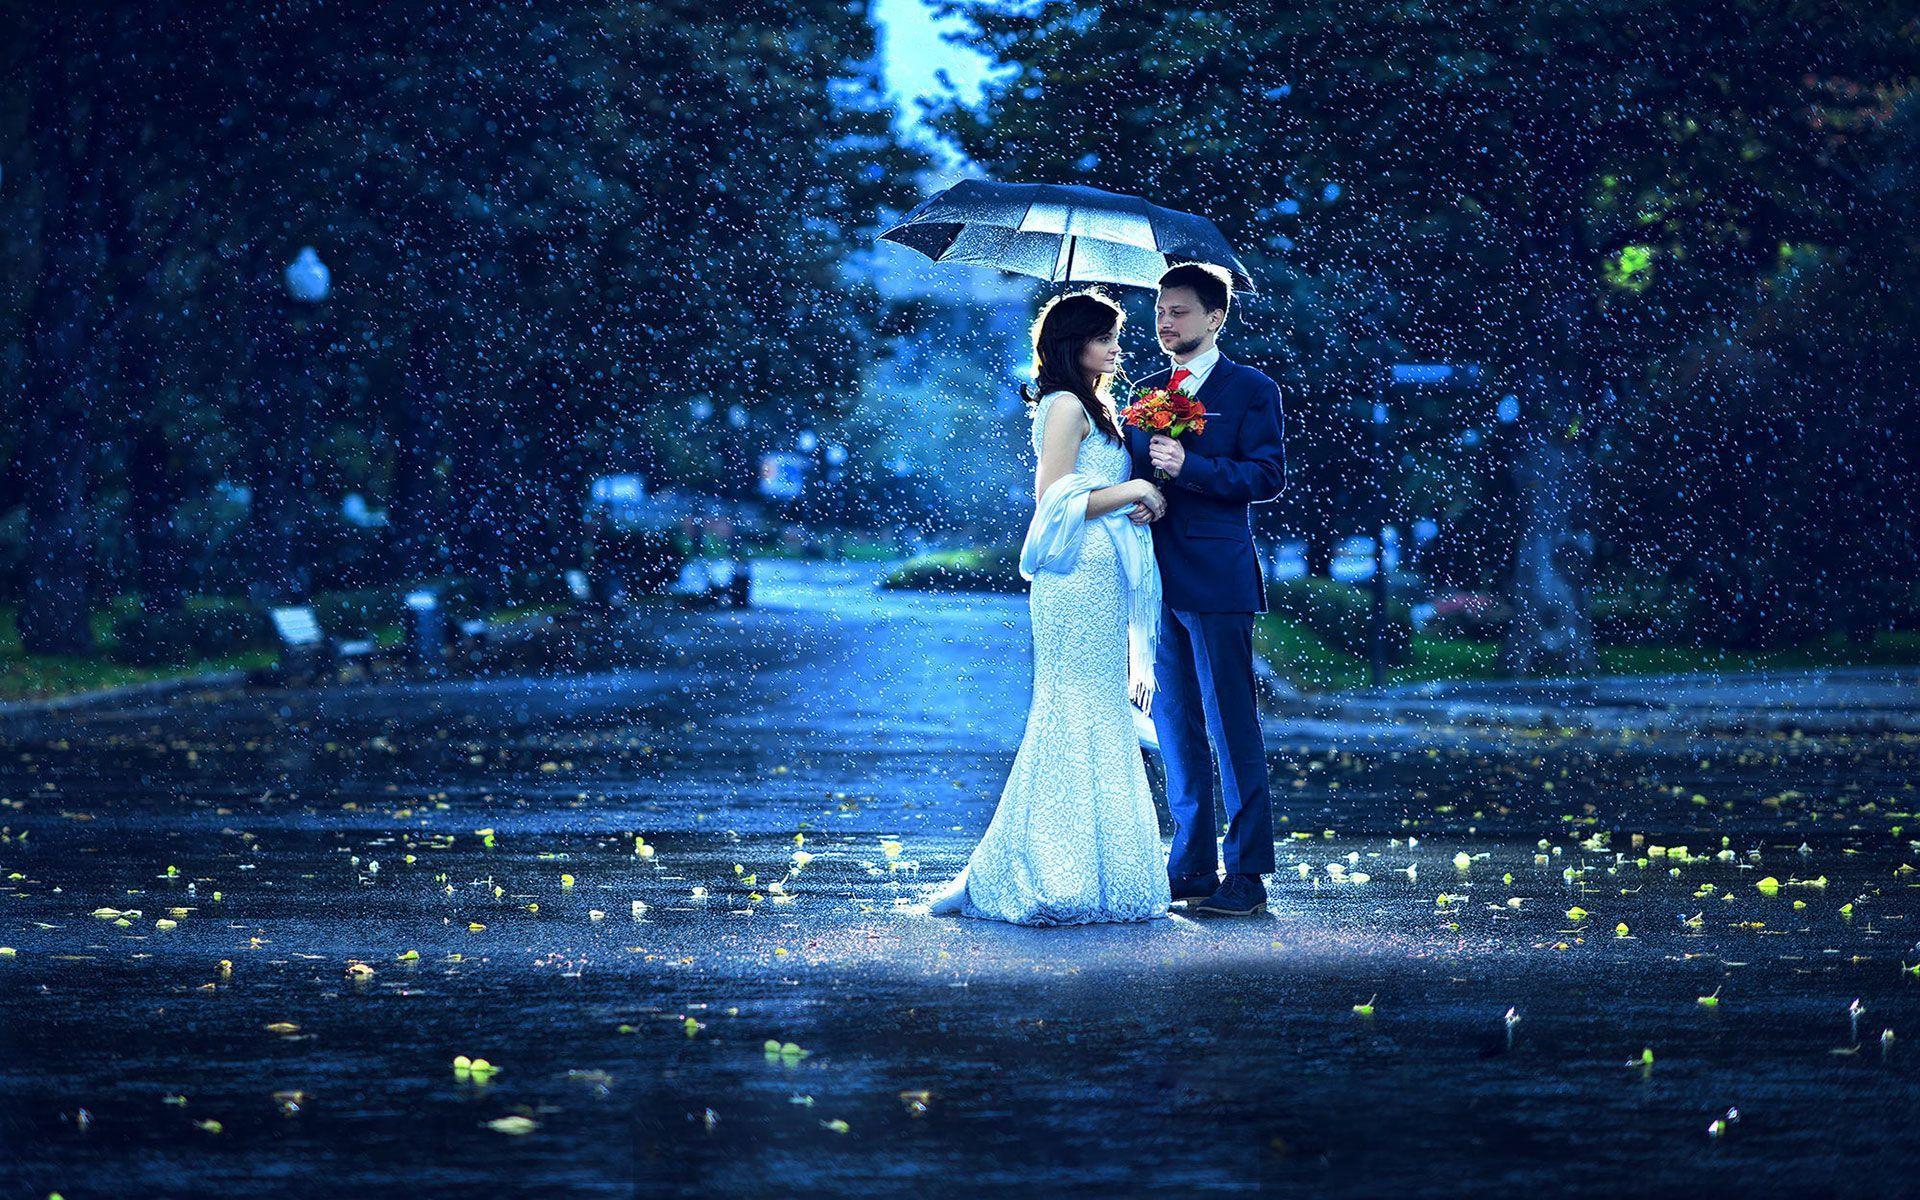 wedding wallpaper 1080p